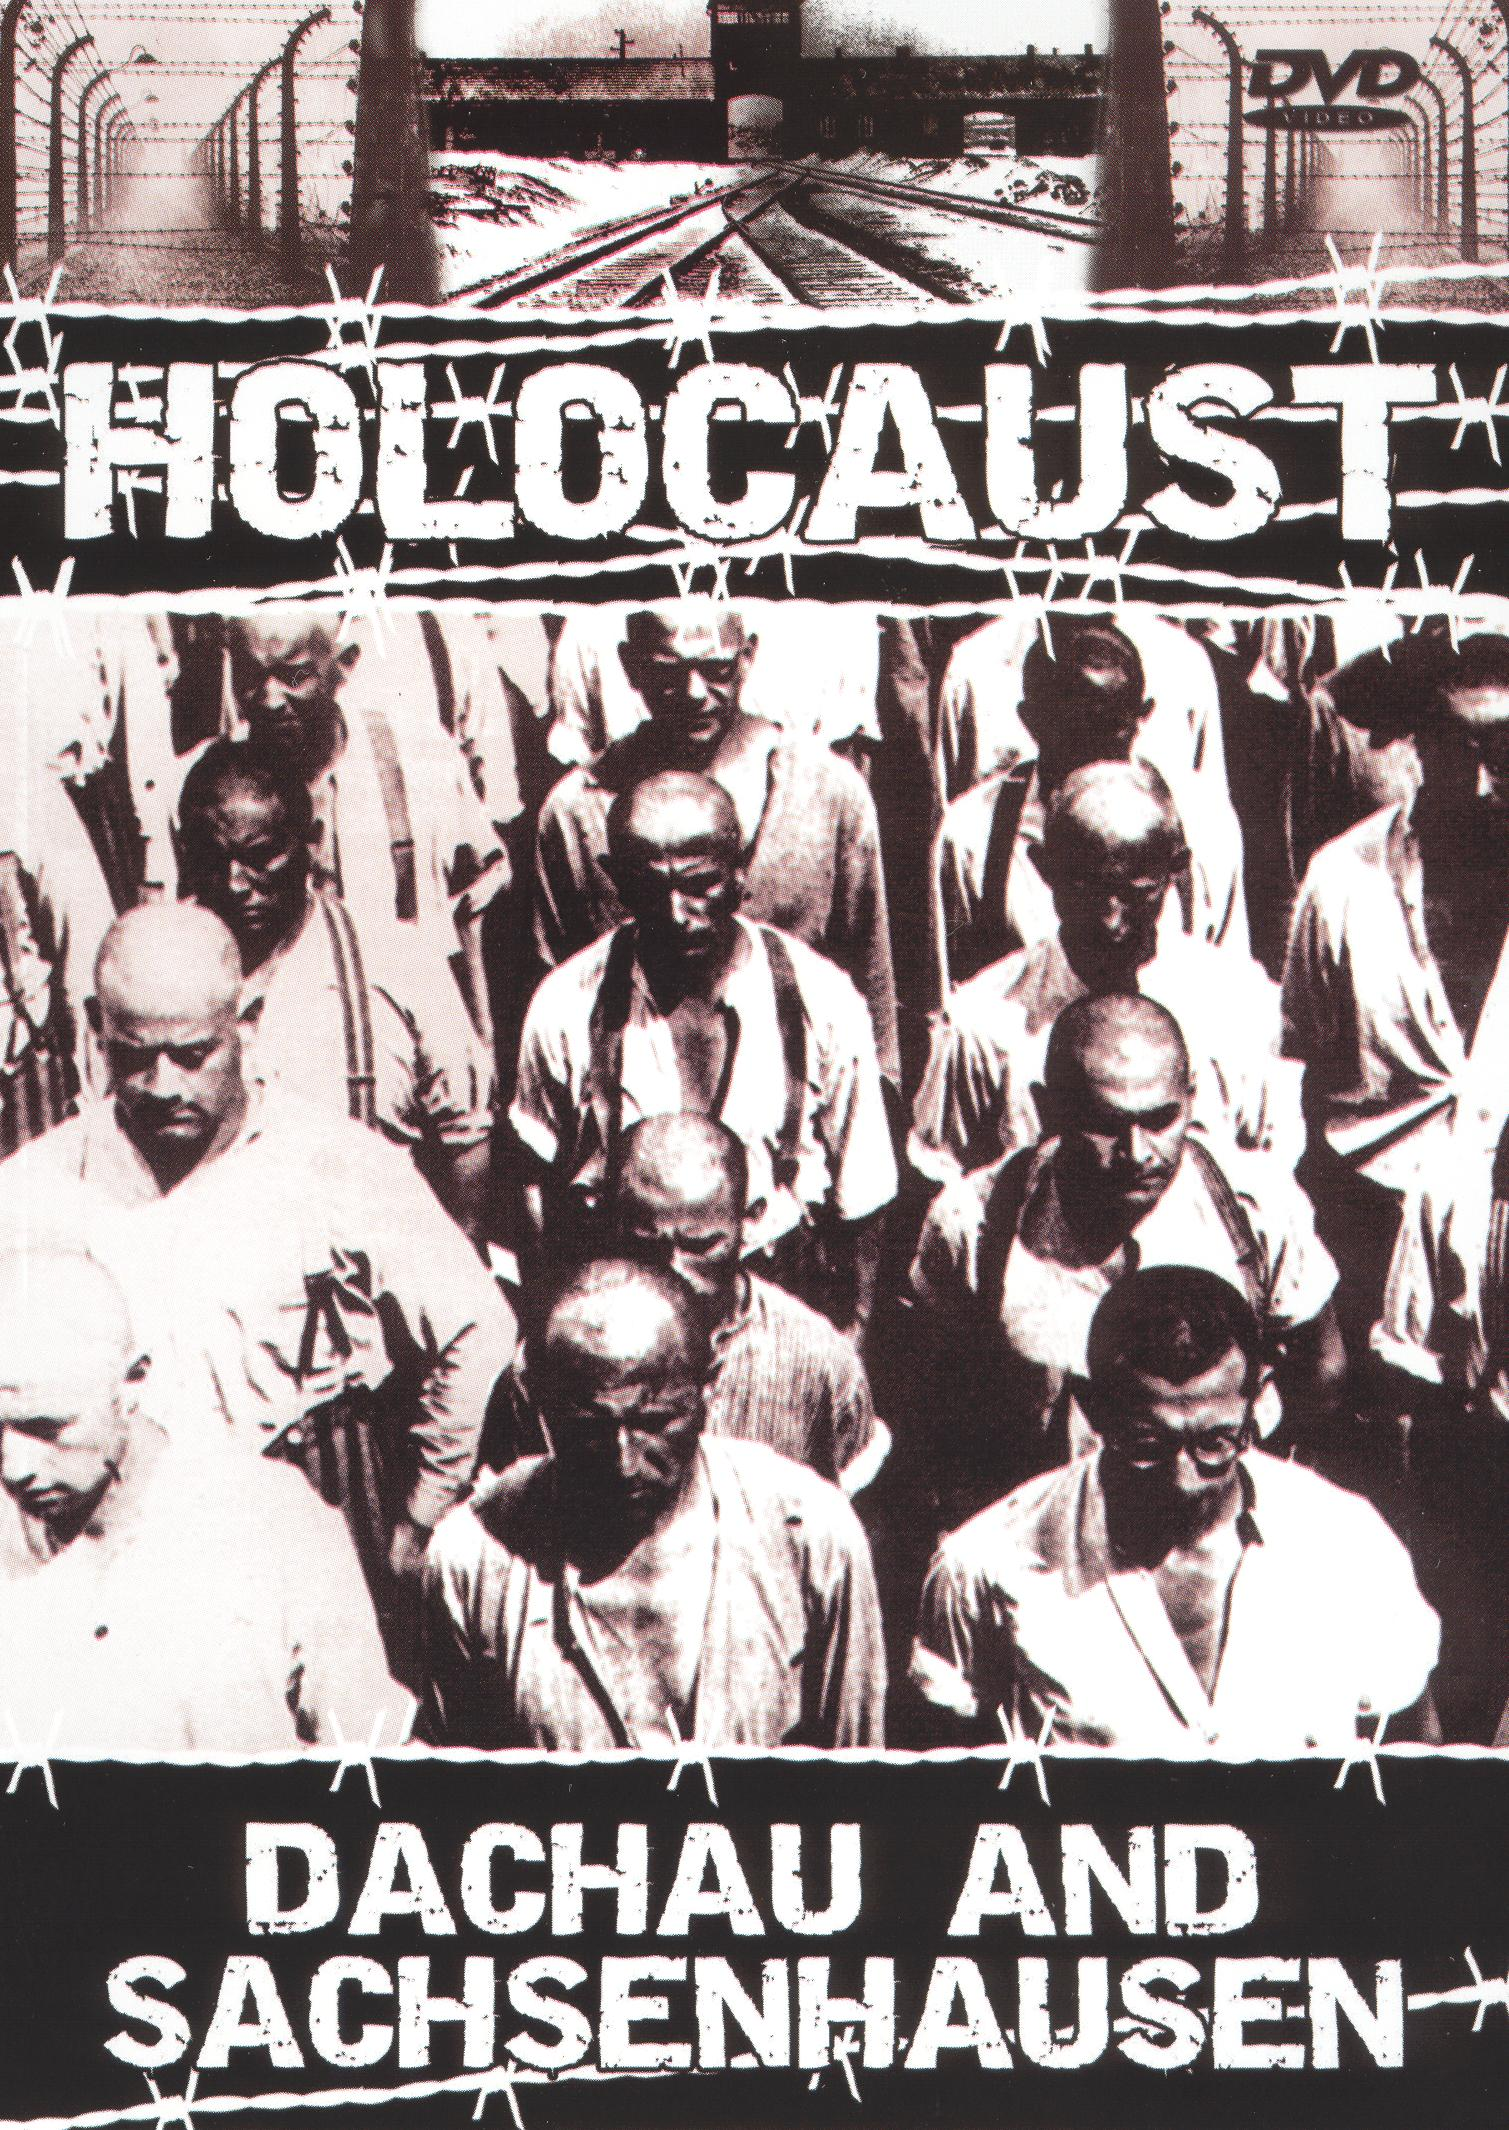 Holocaust: Concentration Camps - Dachau and Sachsenhausen